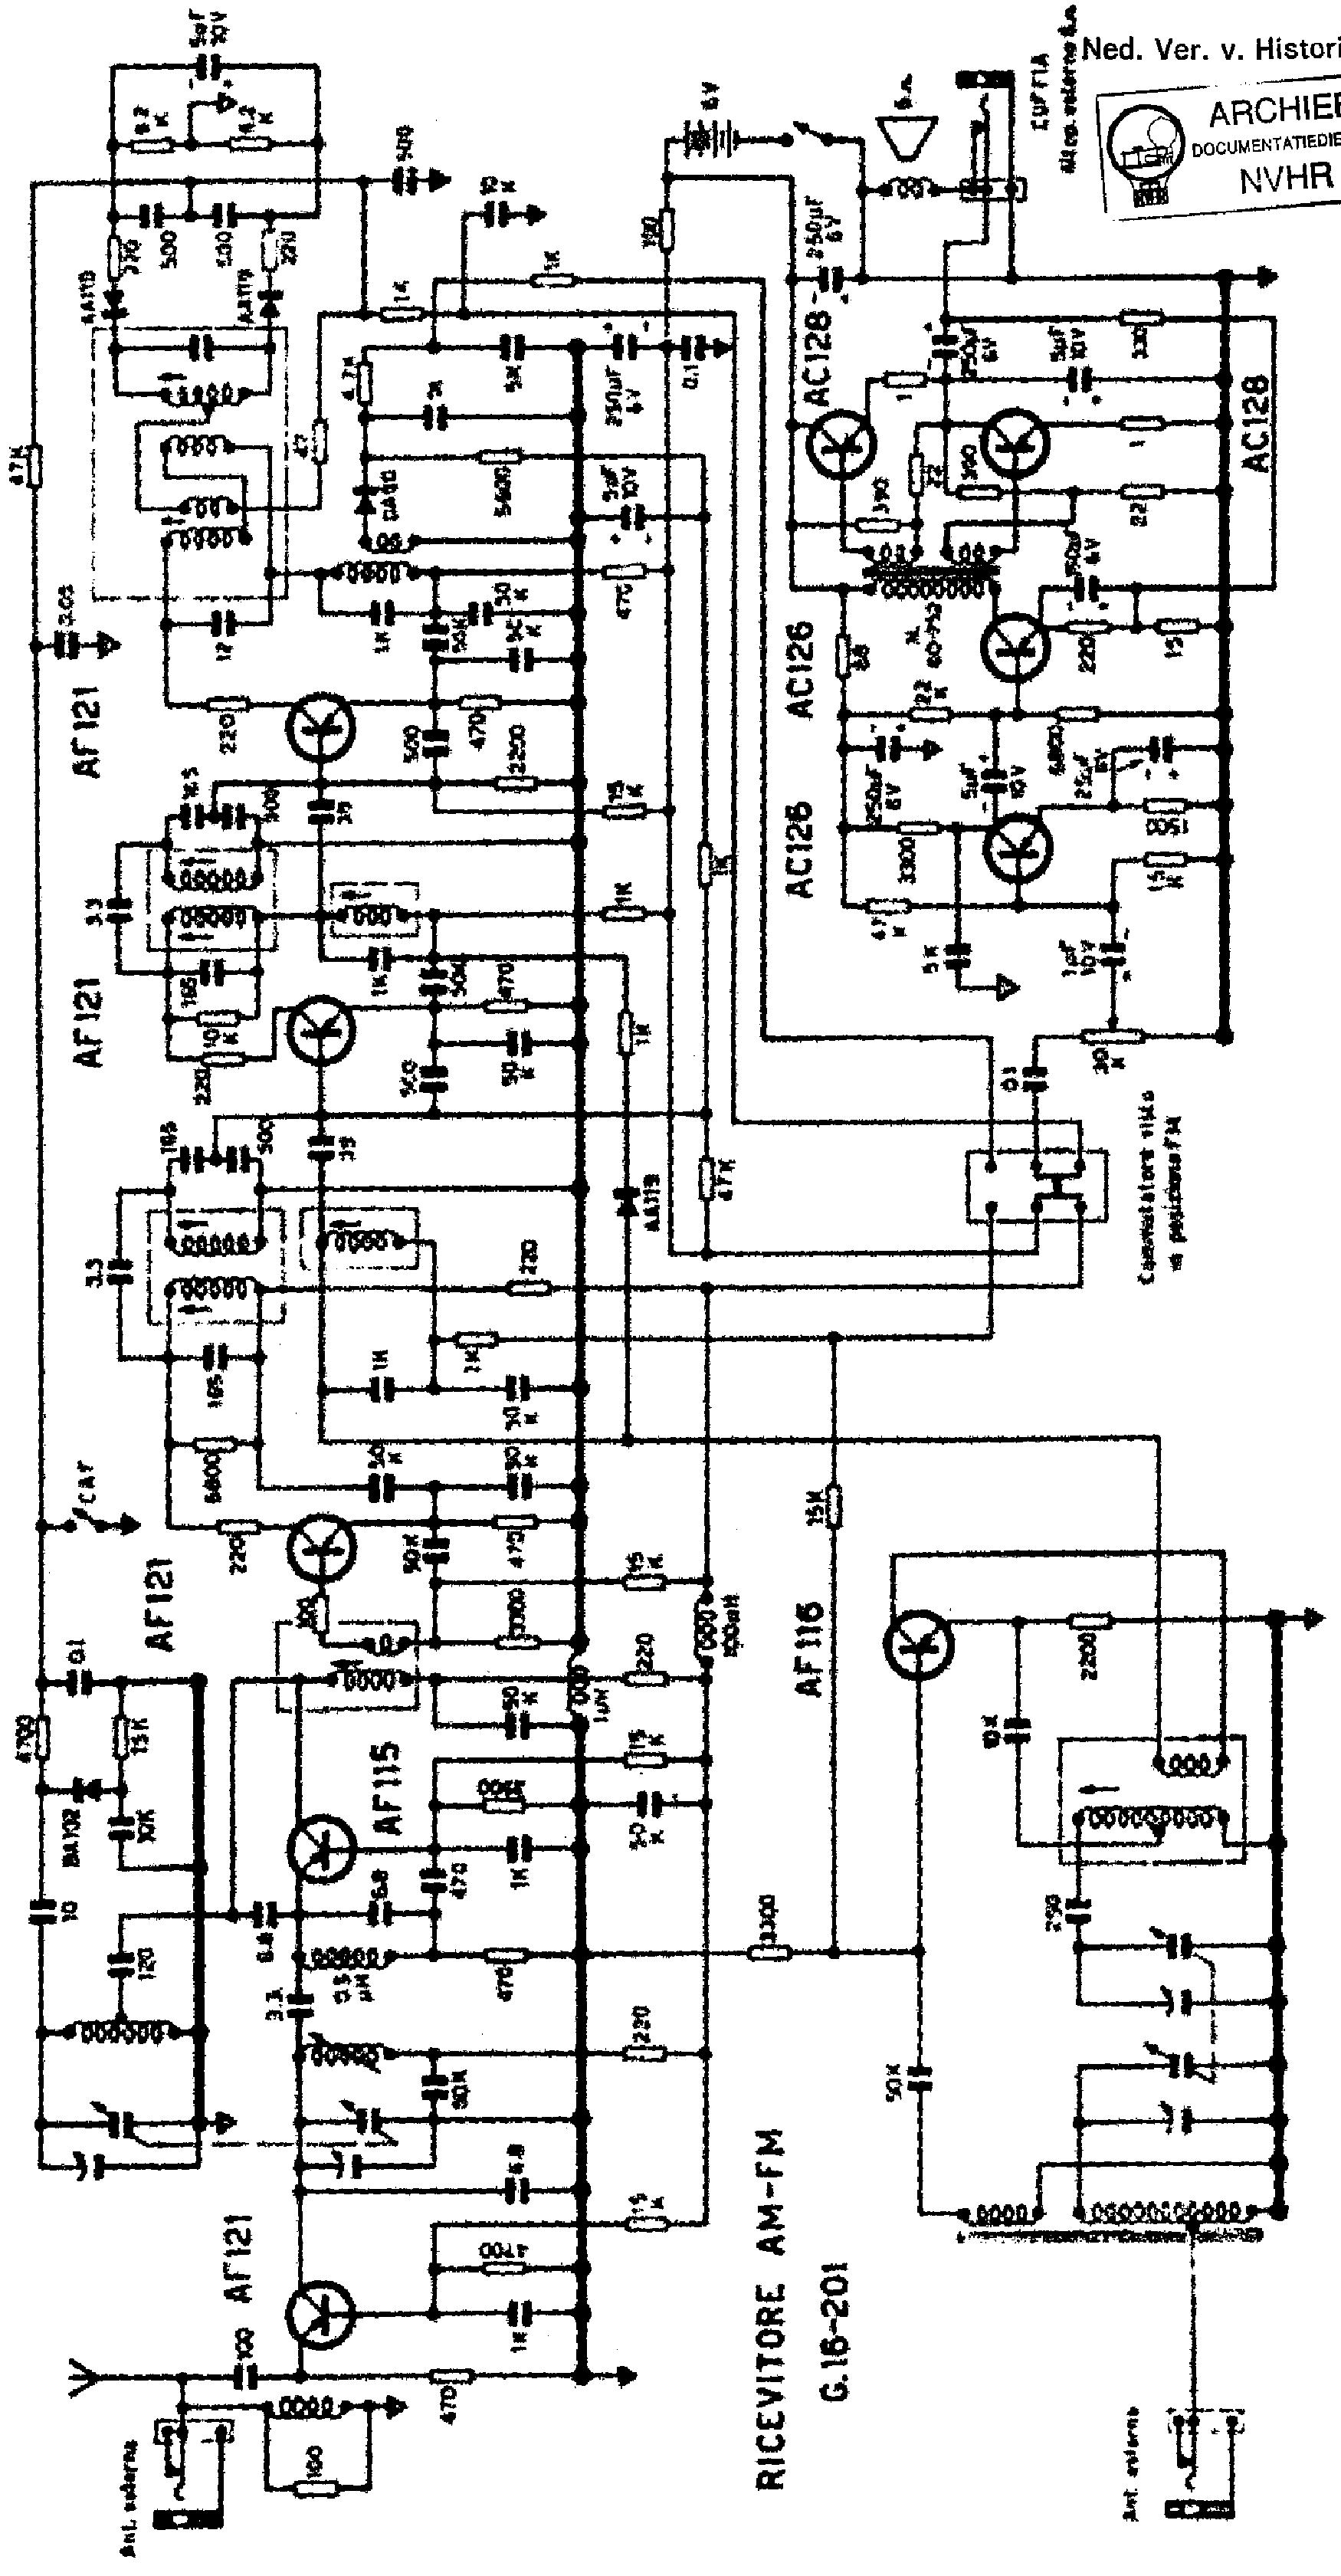 Geloso G273a Schematic Diagam Switch Diagram Suzukisavagecom Fictional Wiring 2x807 Audio Amplifier Sch Service Manual Download Rh Elektrotanya Com